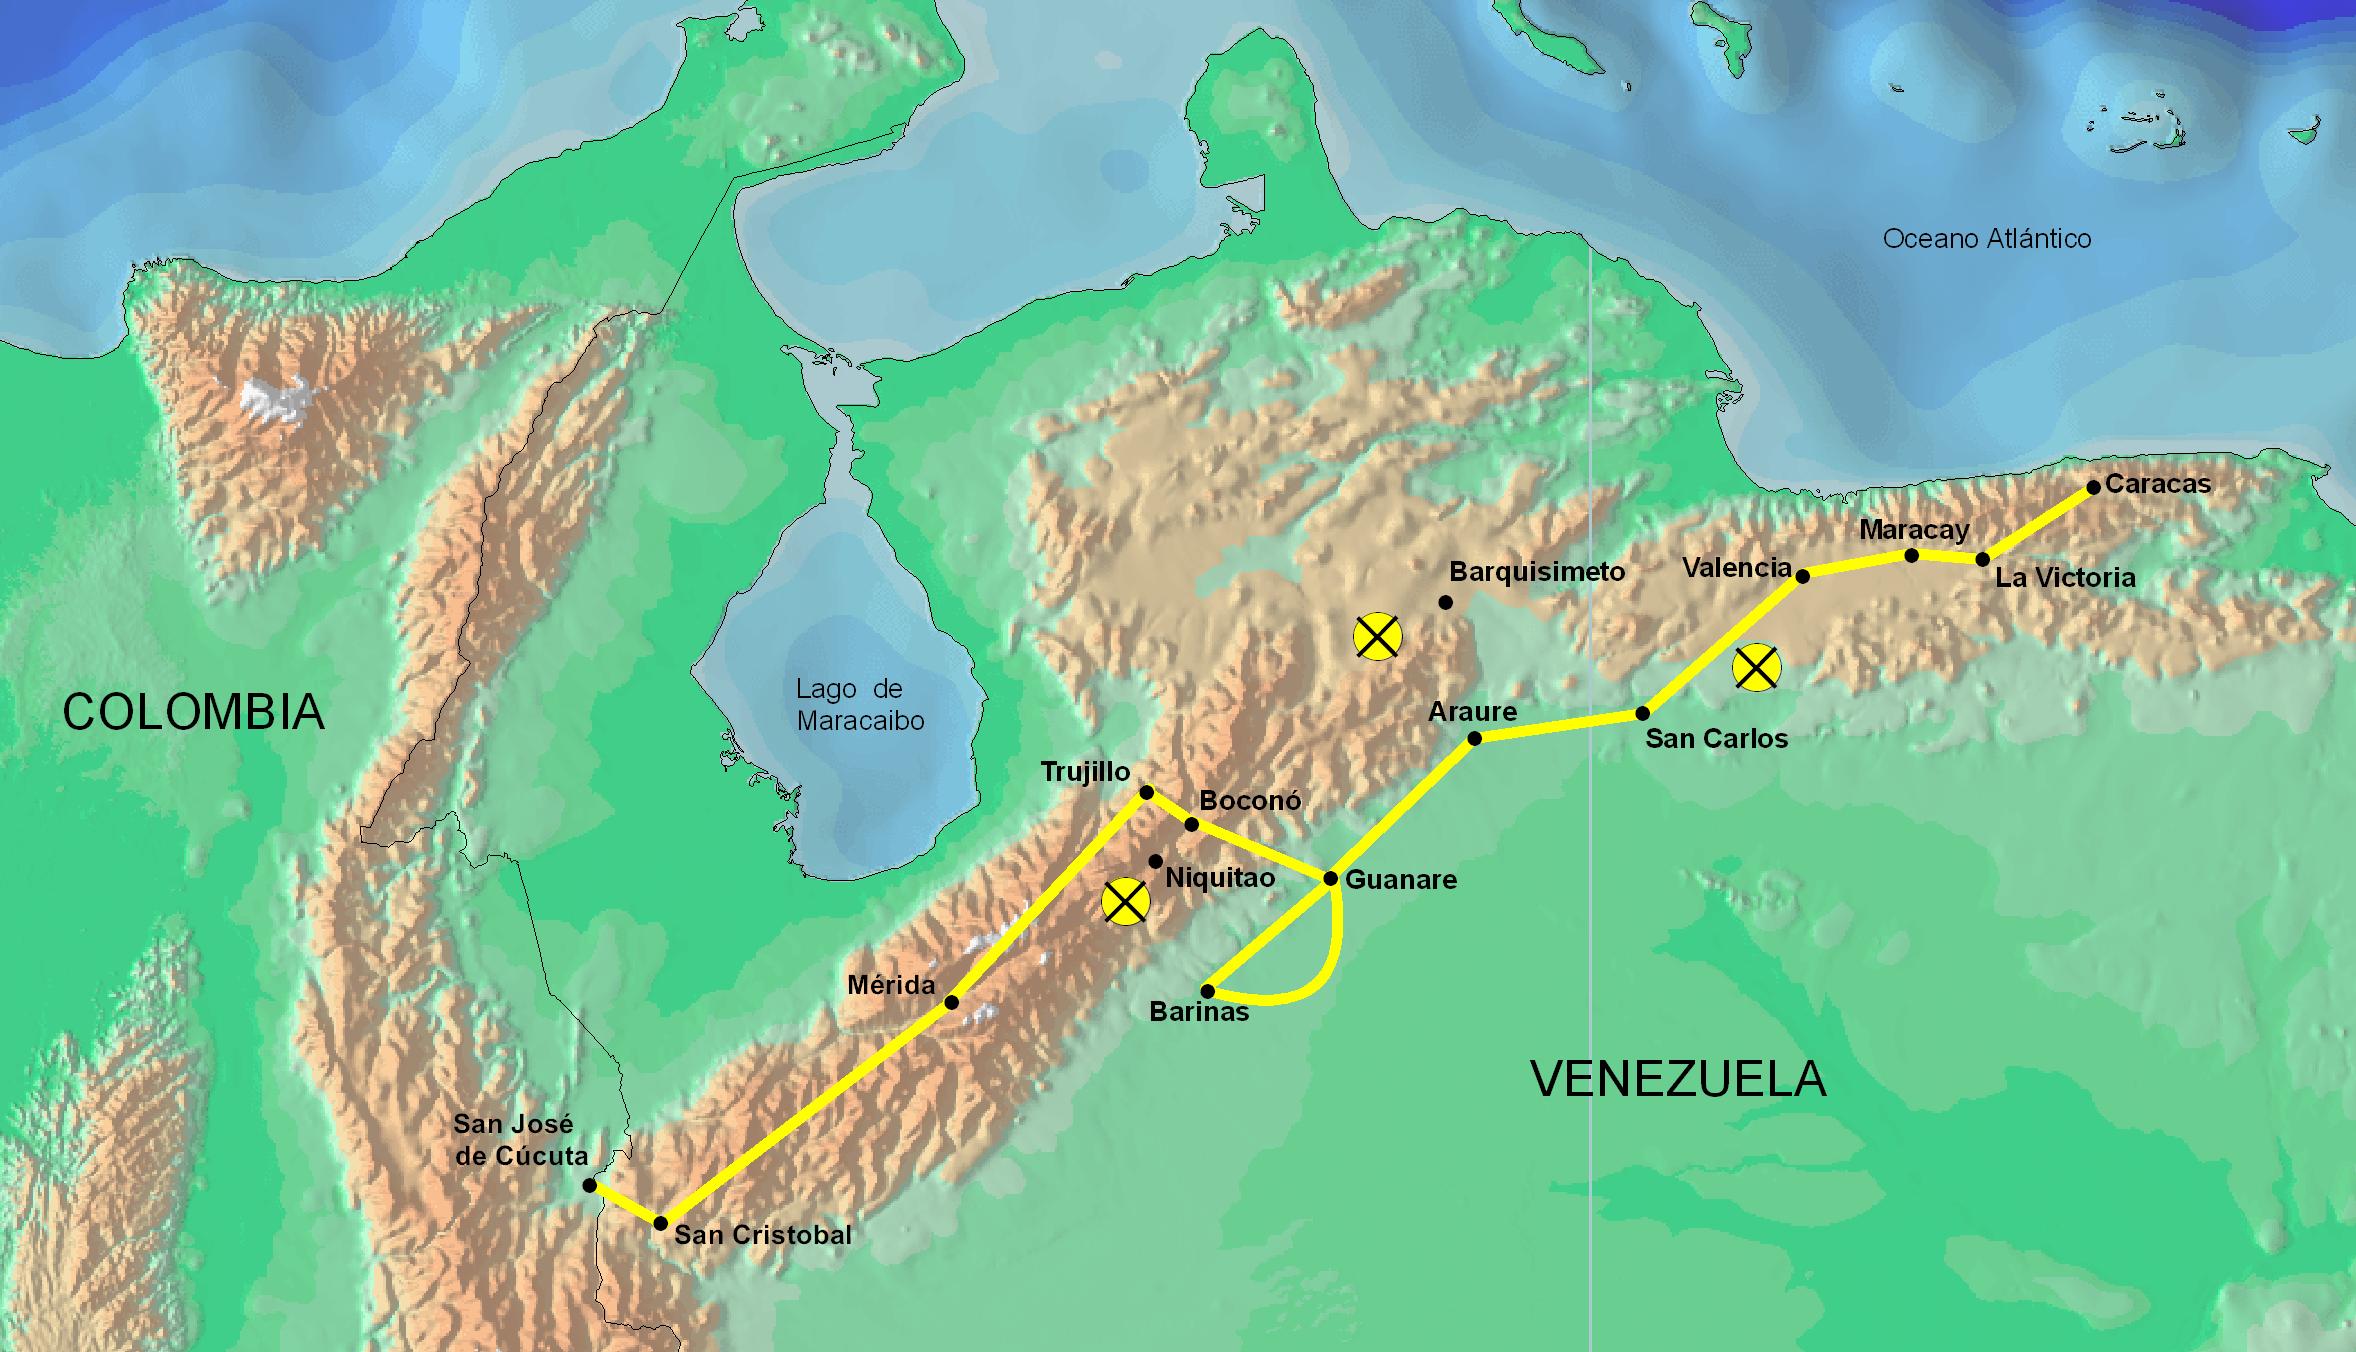 Route of the Admirable Campaign, Venezuela 1813